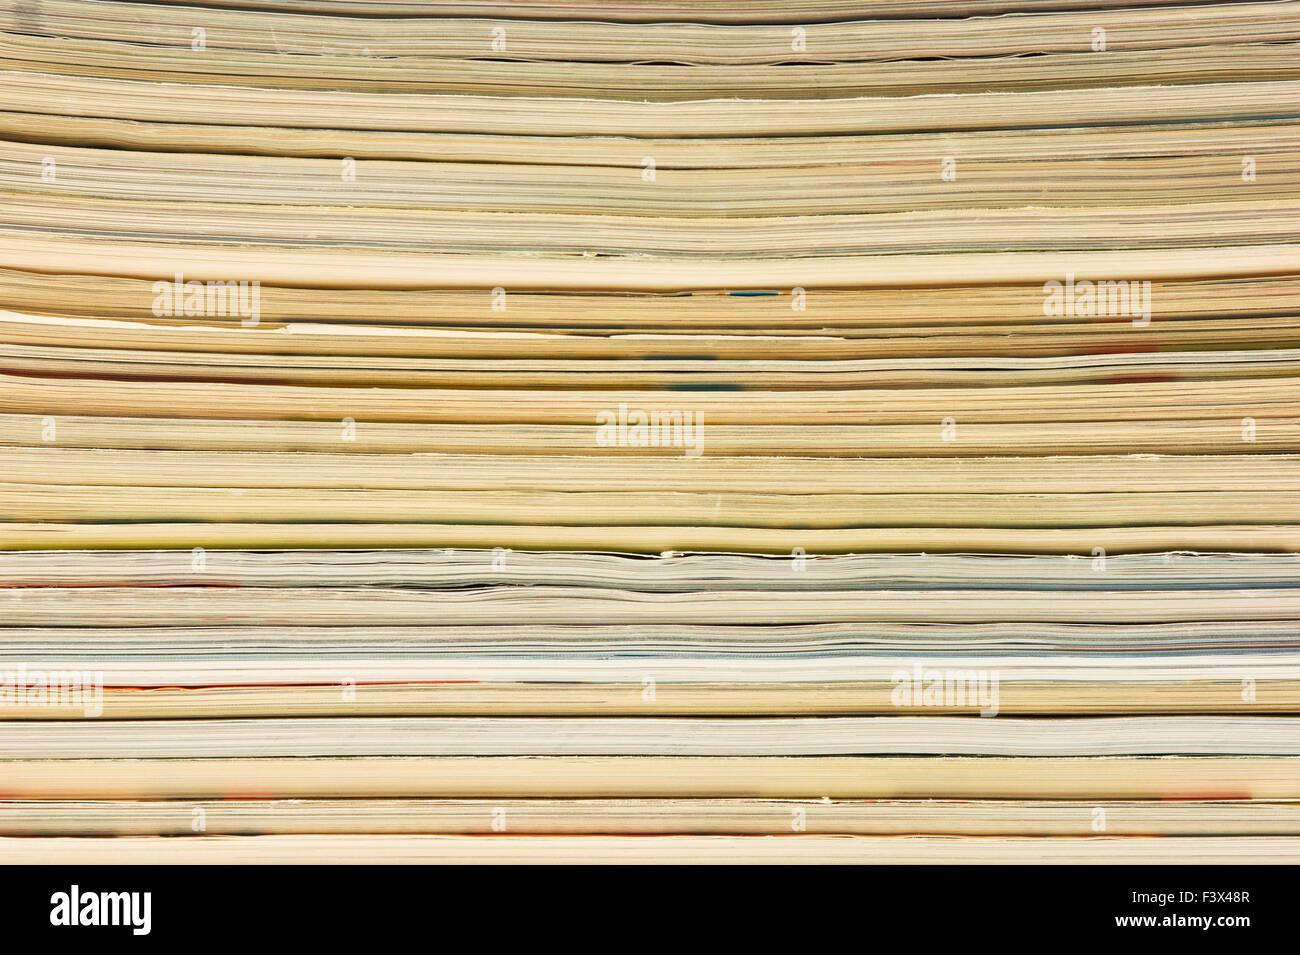 stack of magazines - Stock Image